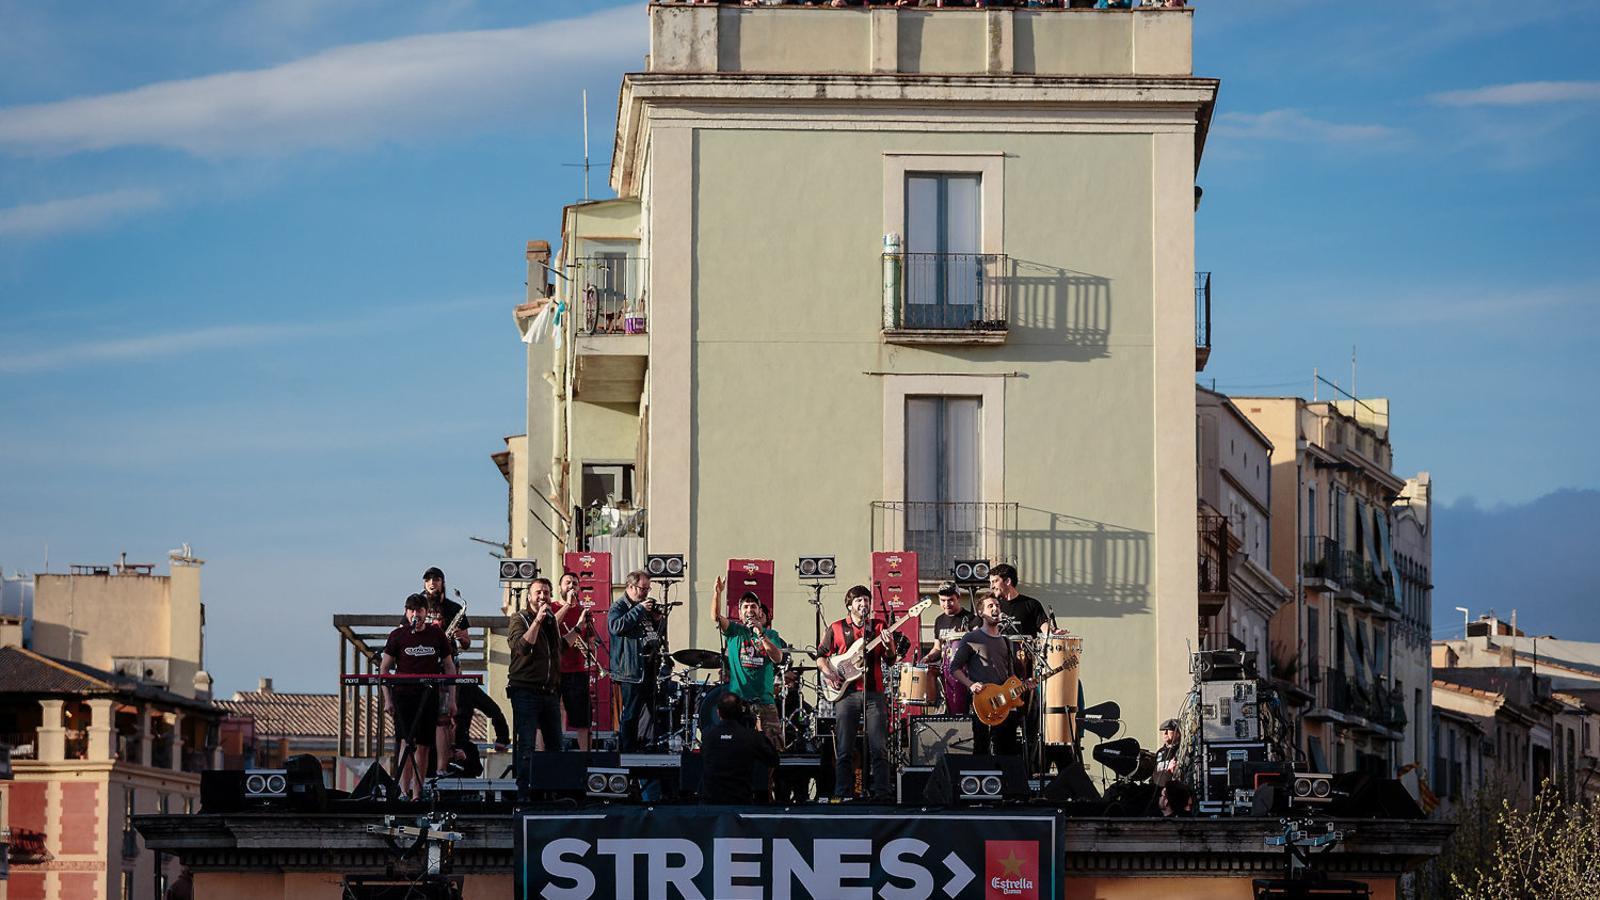 Girona vibra amb txarango a l strenes - Oficina de extranjeria girona ...